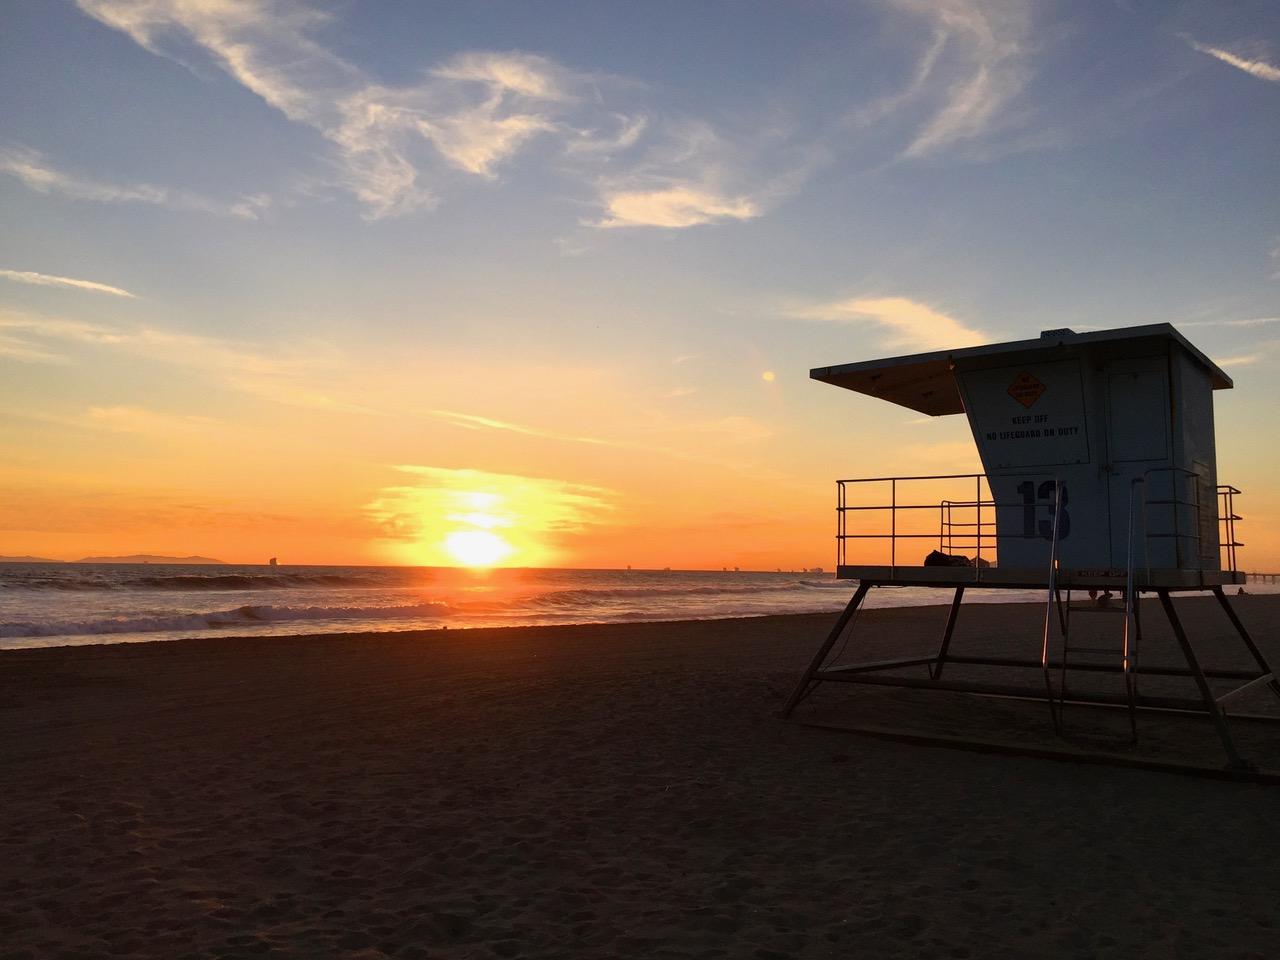 Sunset at Sun City USA Huntington Beach California